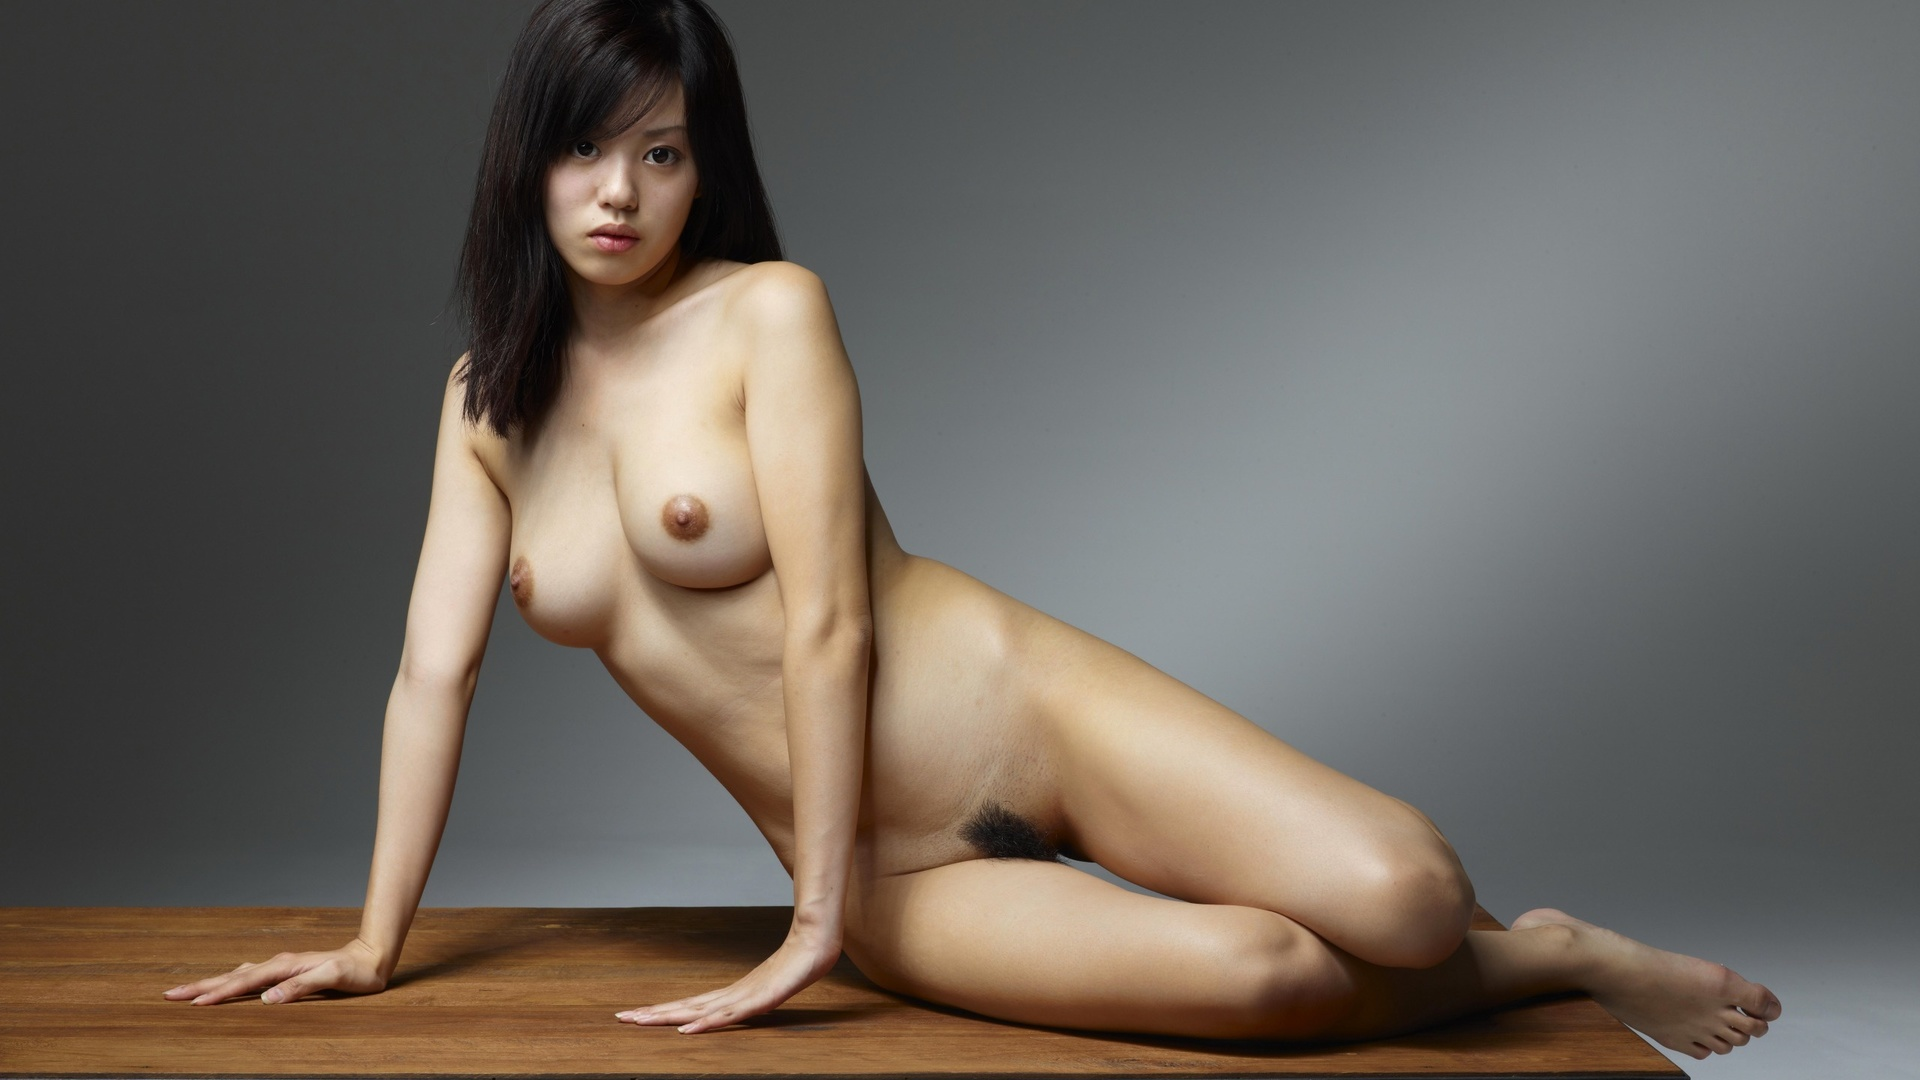 Красивая голая азиатка онлайн